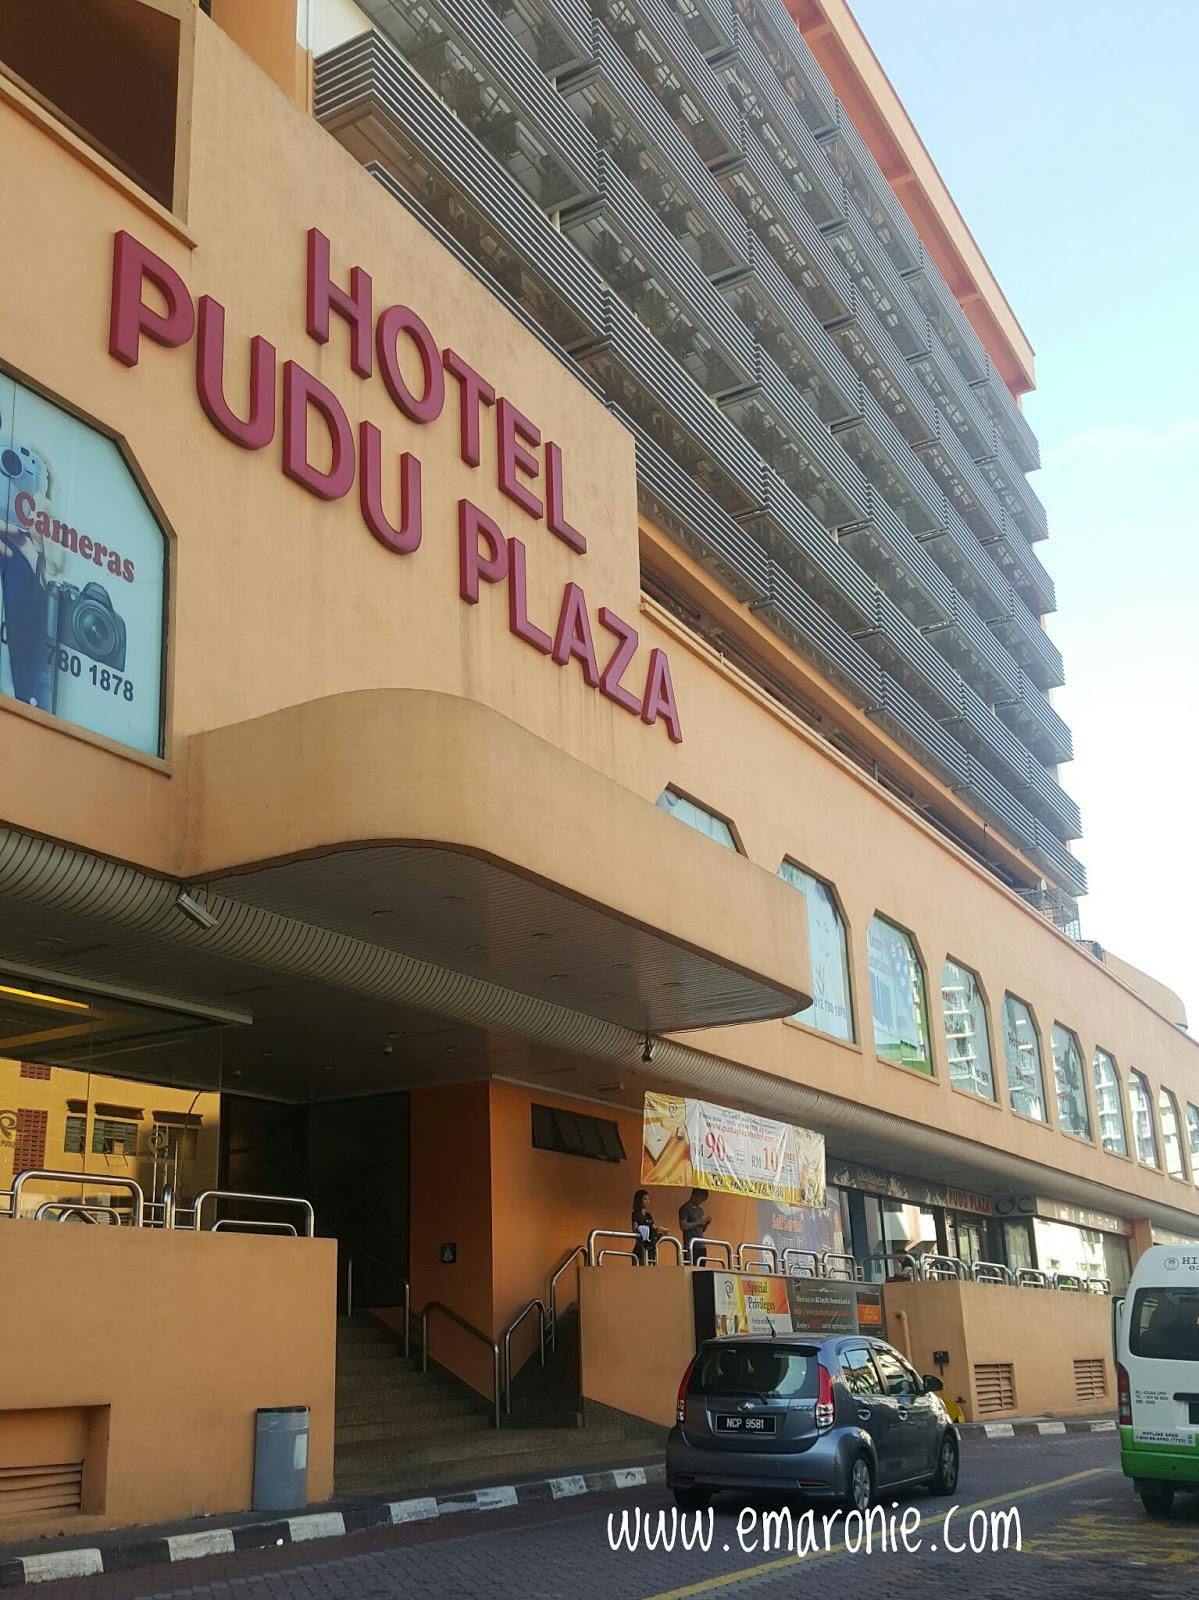 Pudu Plaza Hotel Kuala Lumpur Liburan Di Malaysia Dengan Harga Paket Tour Yang Sangat Murah Dari ART Travel Yakni Hanya Rp3juta Perorang Untuk 4